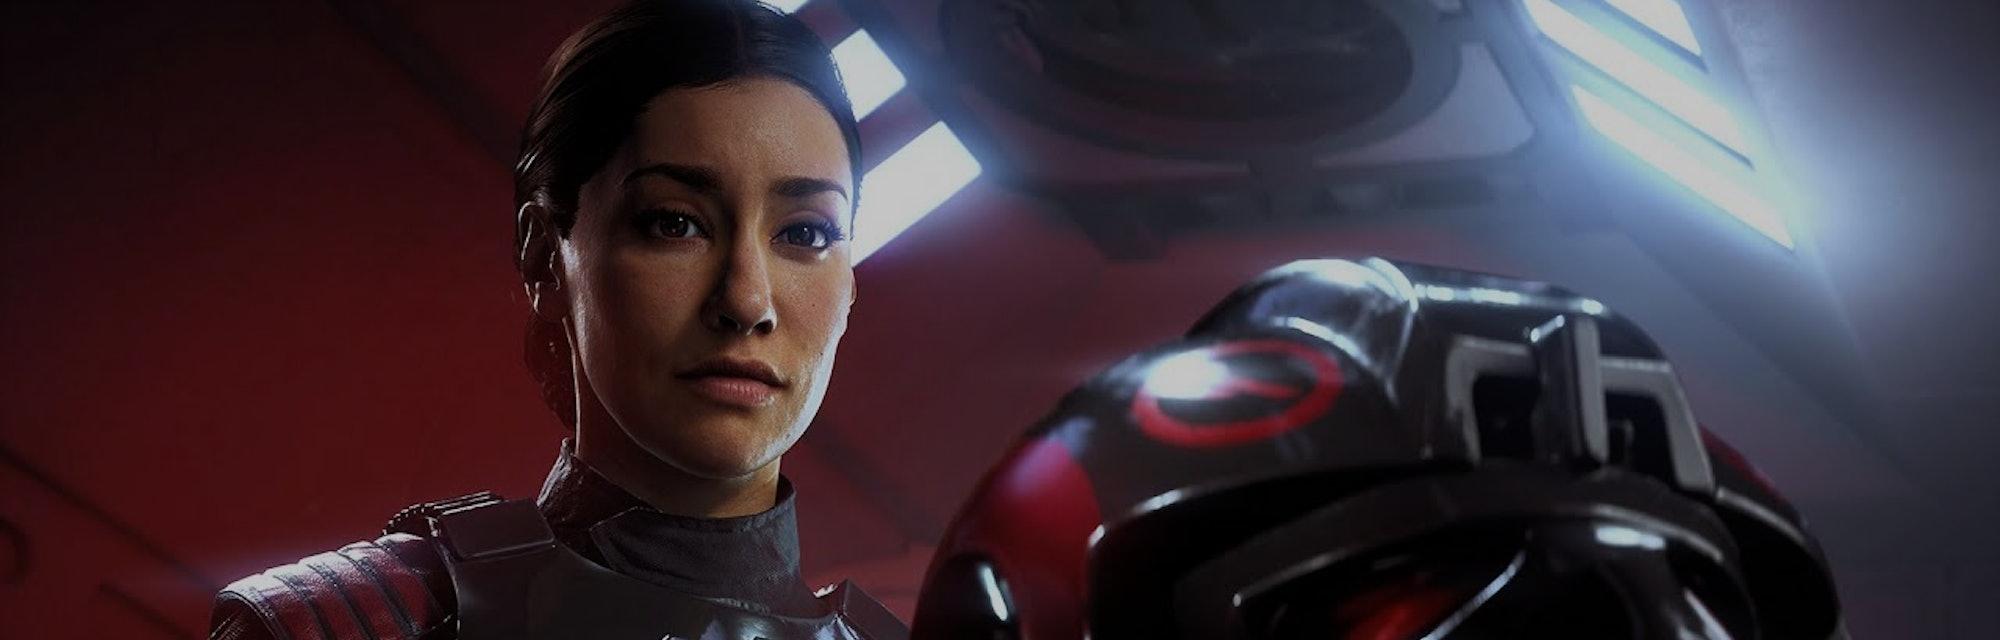 Mandalorian Season 2 Spoilers Video Game Actress Fuels Alleged Cast Leak